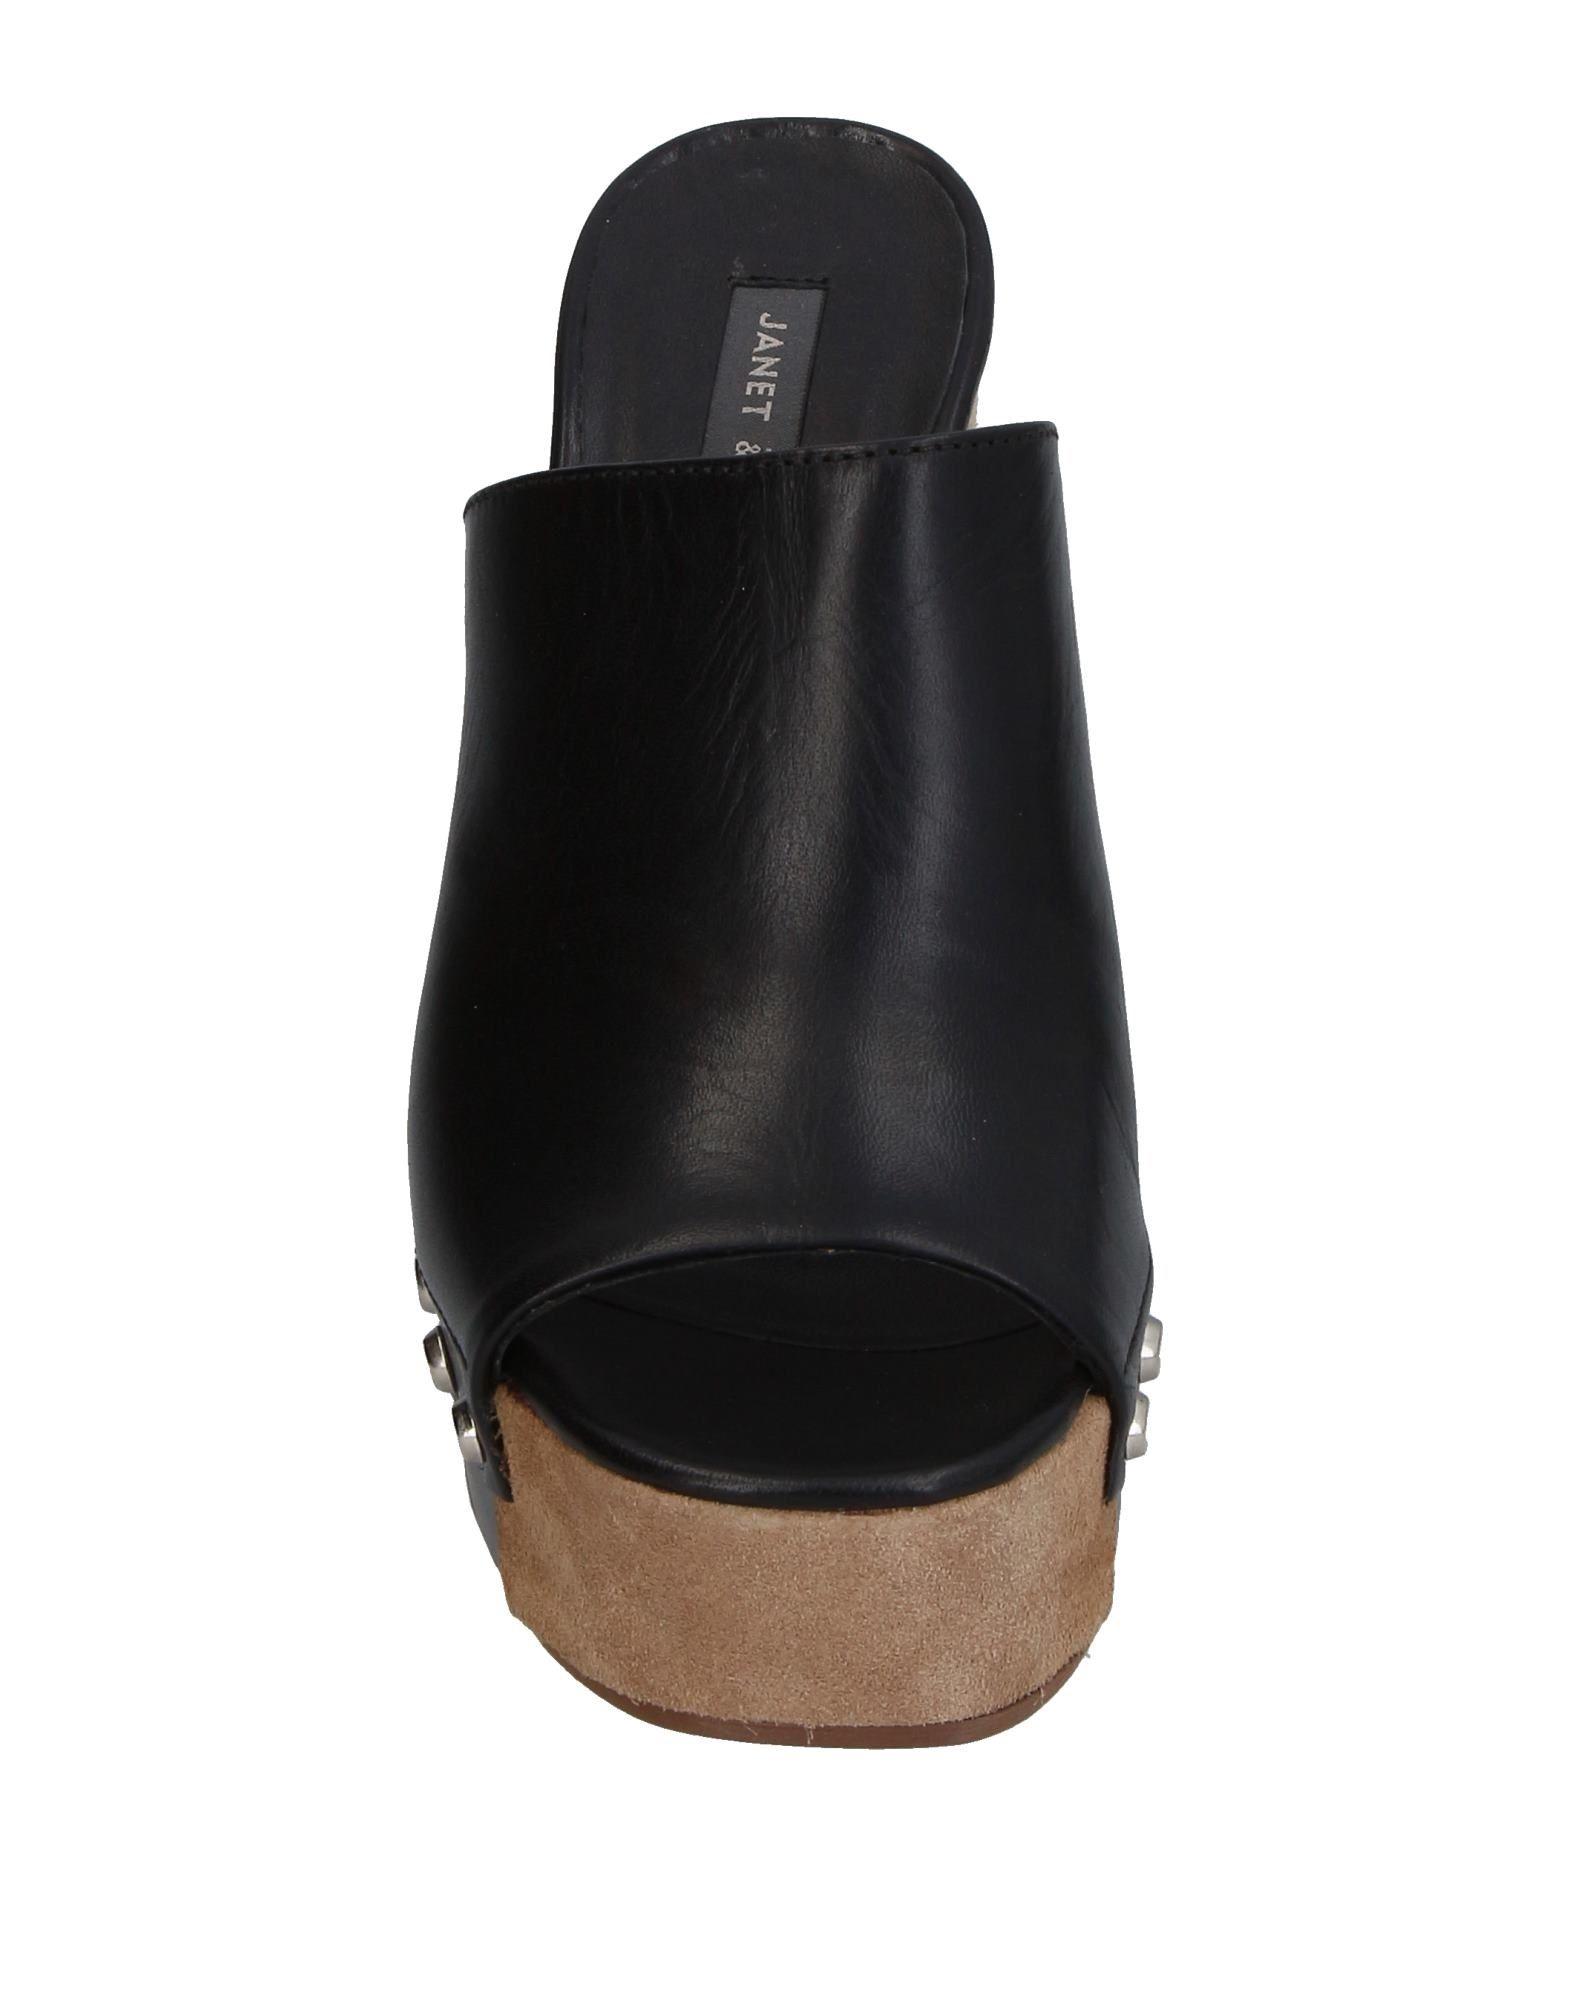 Gut Janet um billige Schuhe zu tragenJanet & Janet Gut Pantoletten Damen  11399096QK c4da24